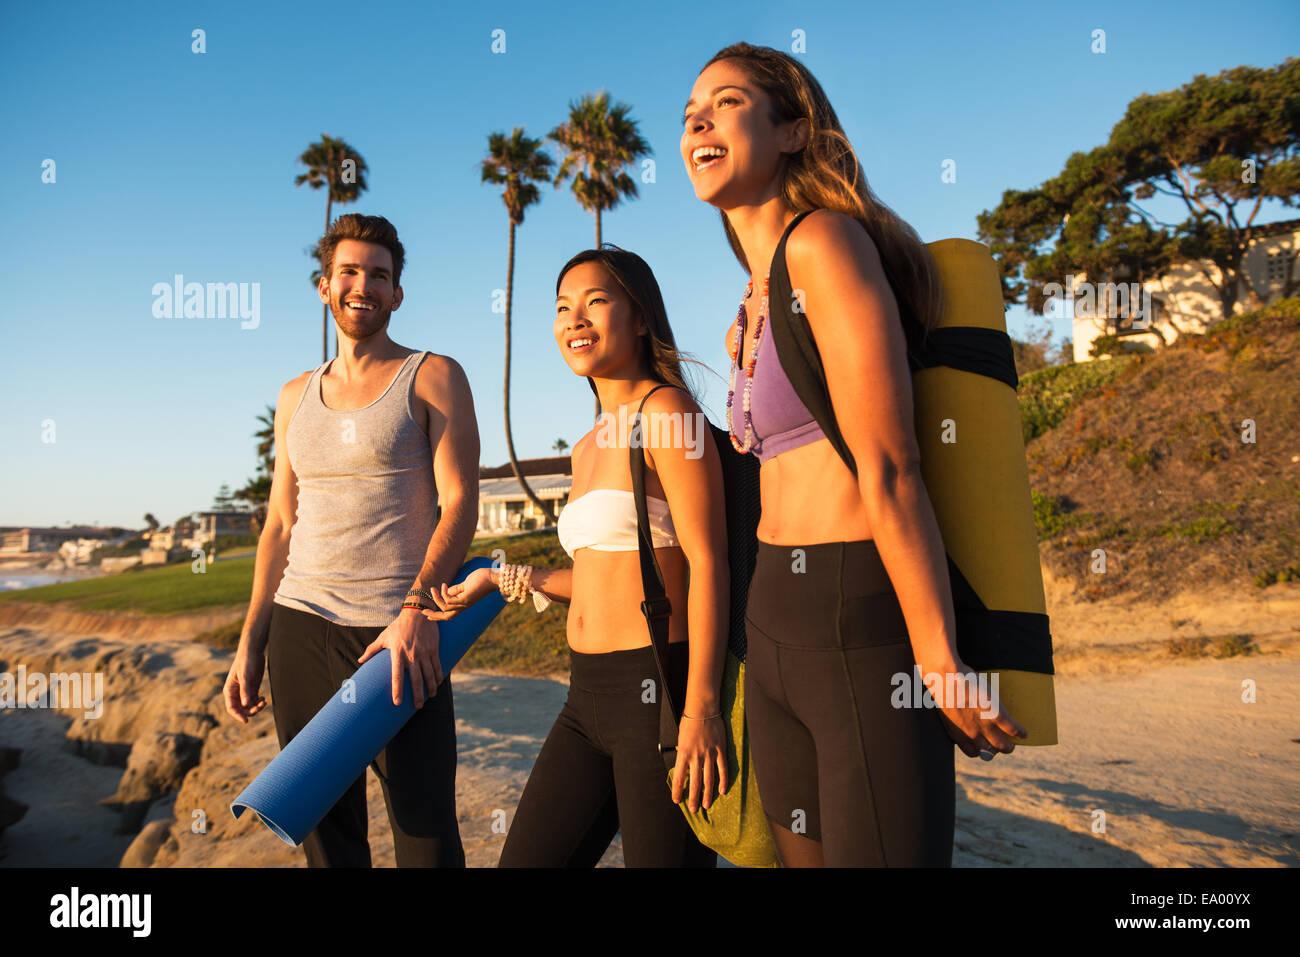 Yogis arriving at Windansea beach, La Jolla, California - Stock Image